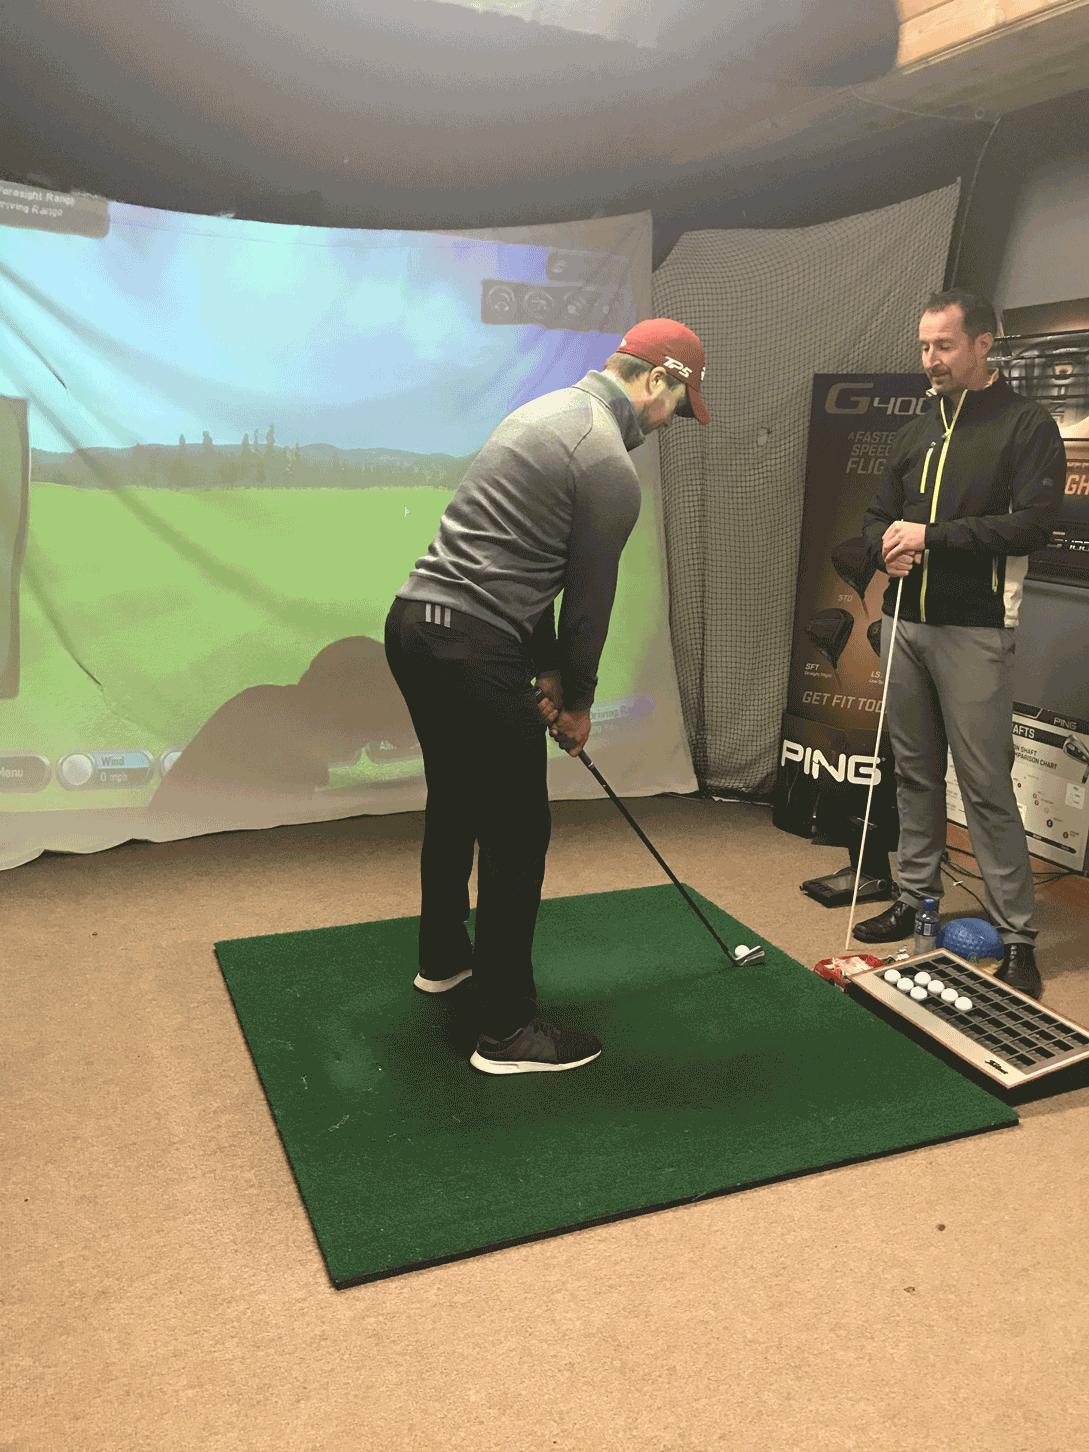 Golf Lessons at Clontarf Golf Club